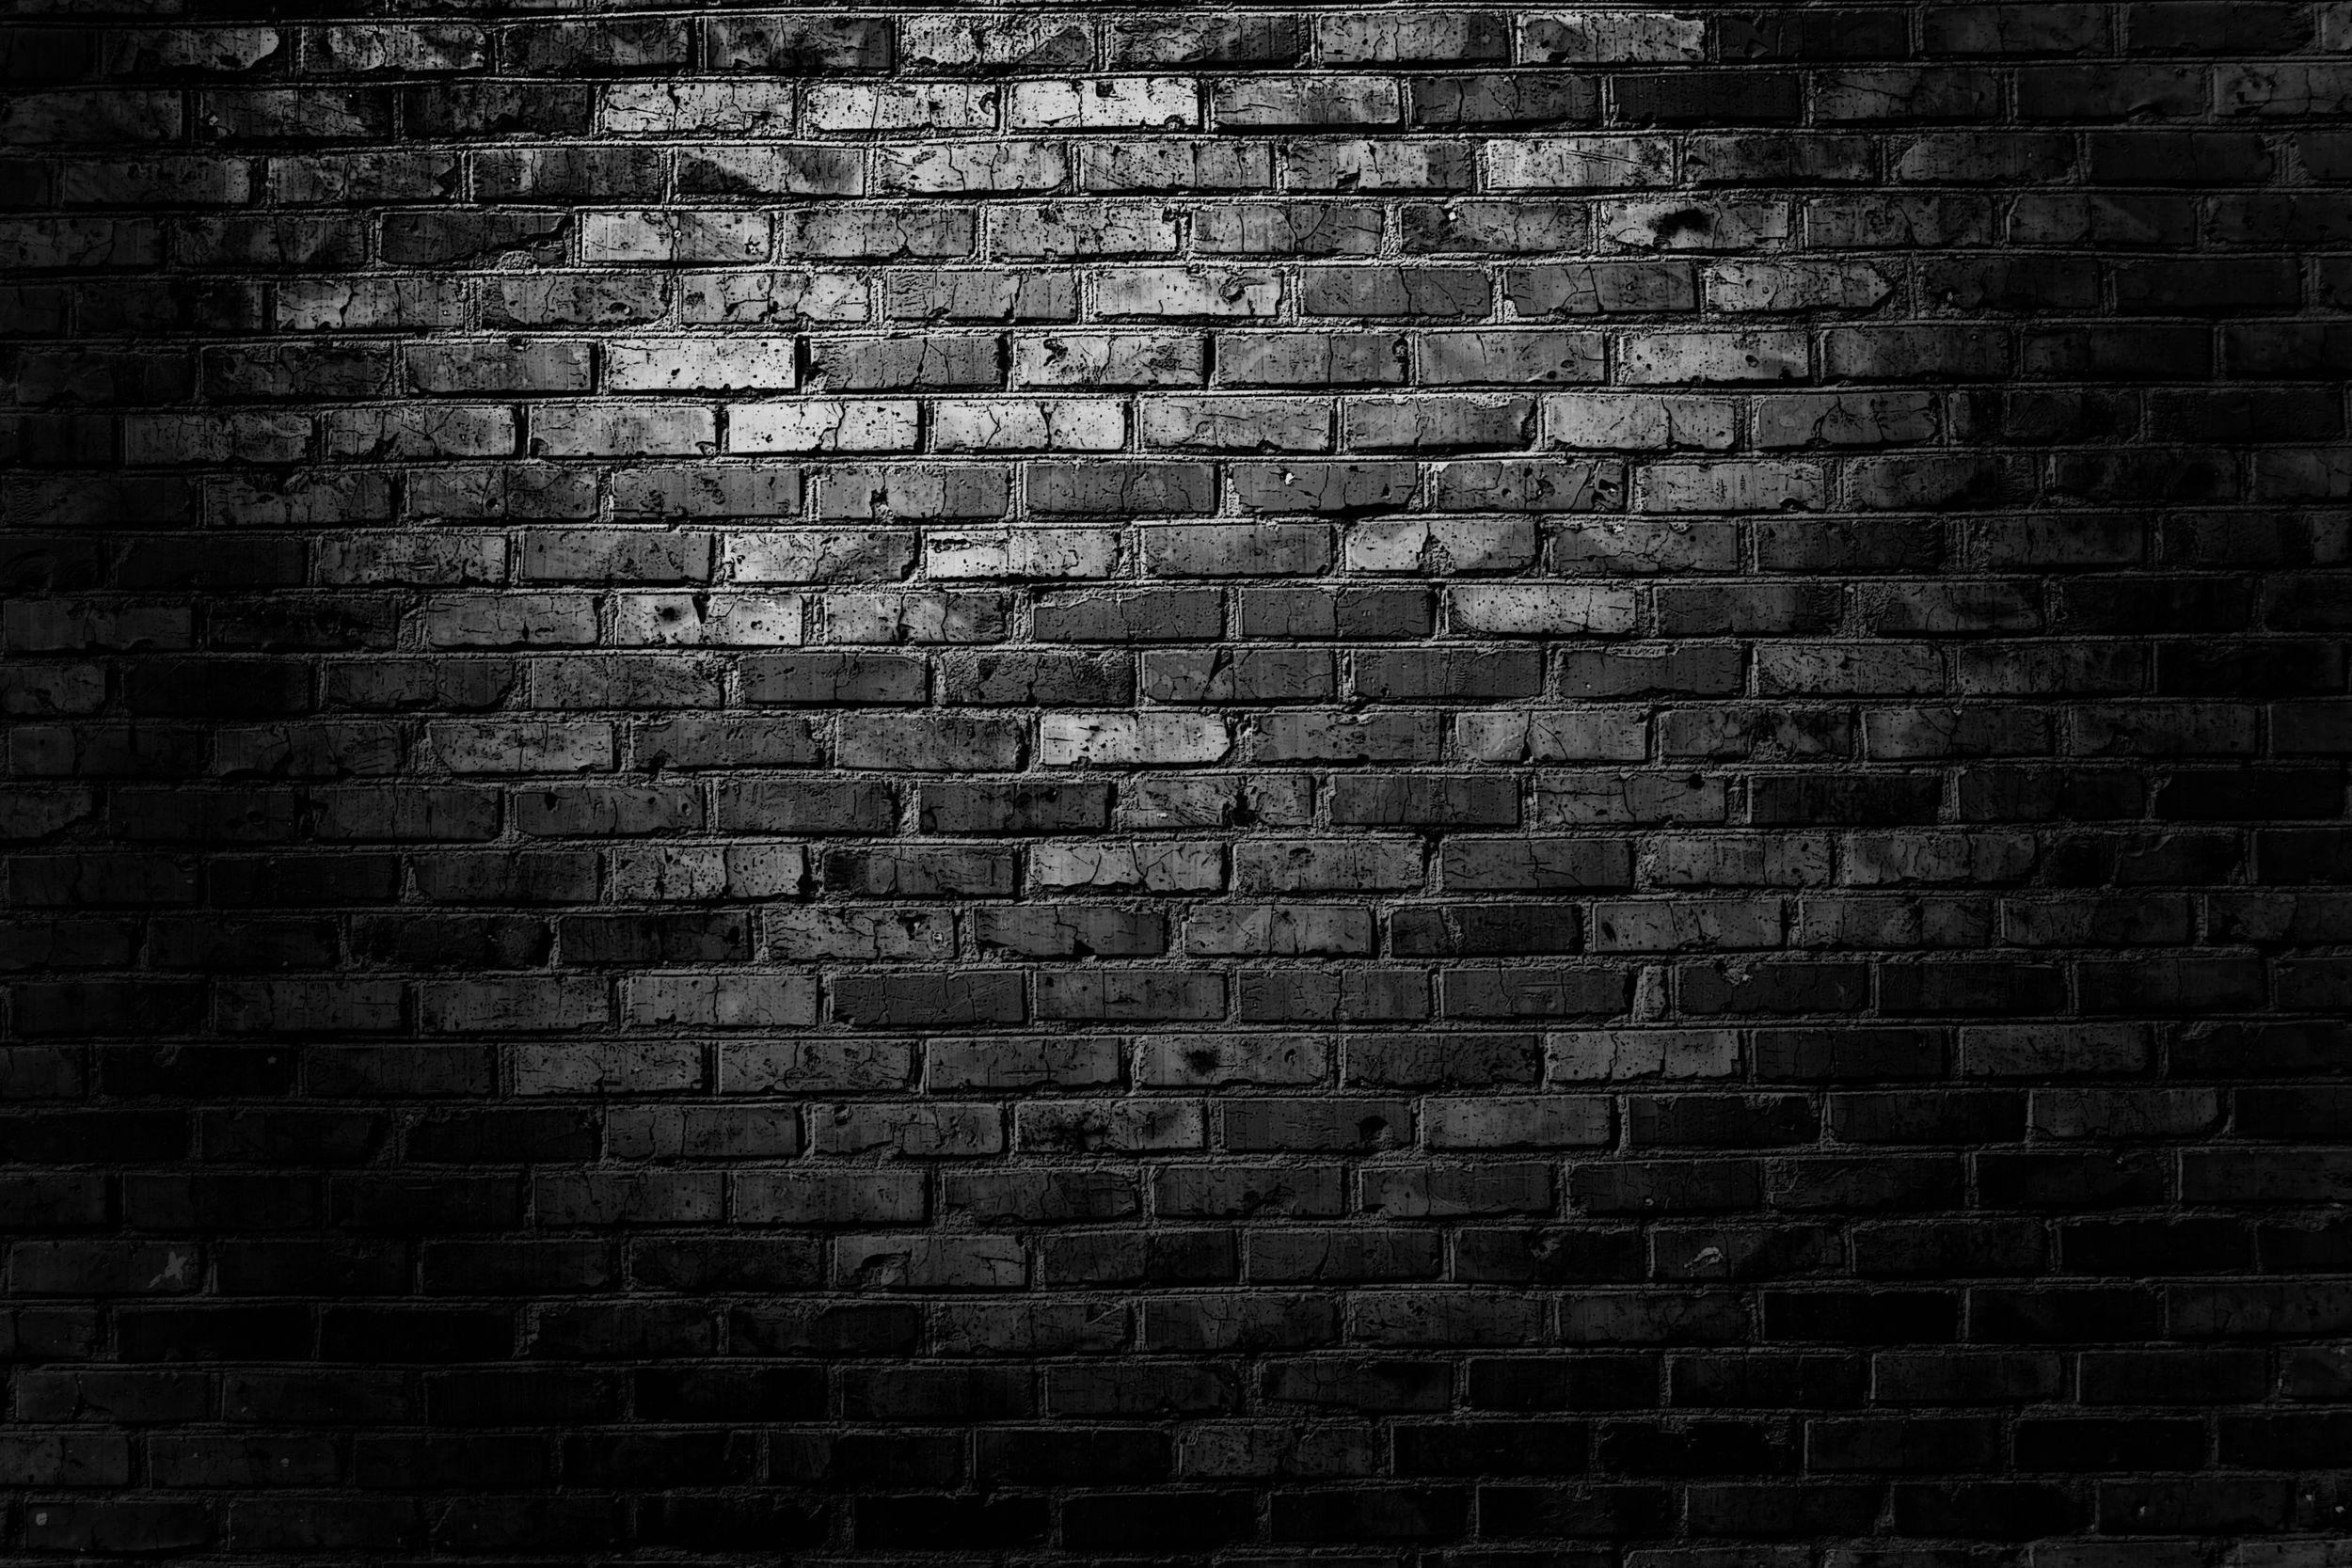 Dark Wall Wallpapers Top Free Dark Wall Backgrounds Wallpaperaccess Black Brick Wall Black Brick Wallpaper Brick Wall Background